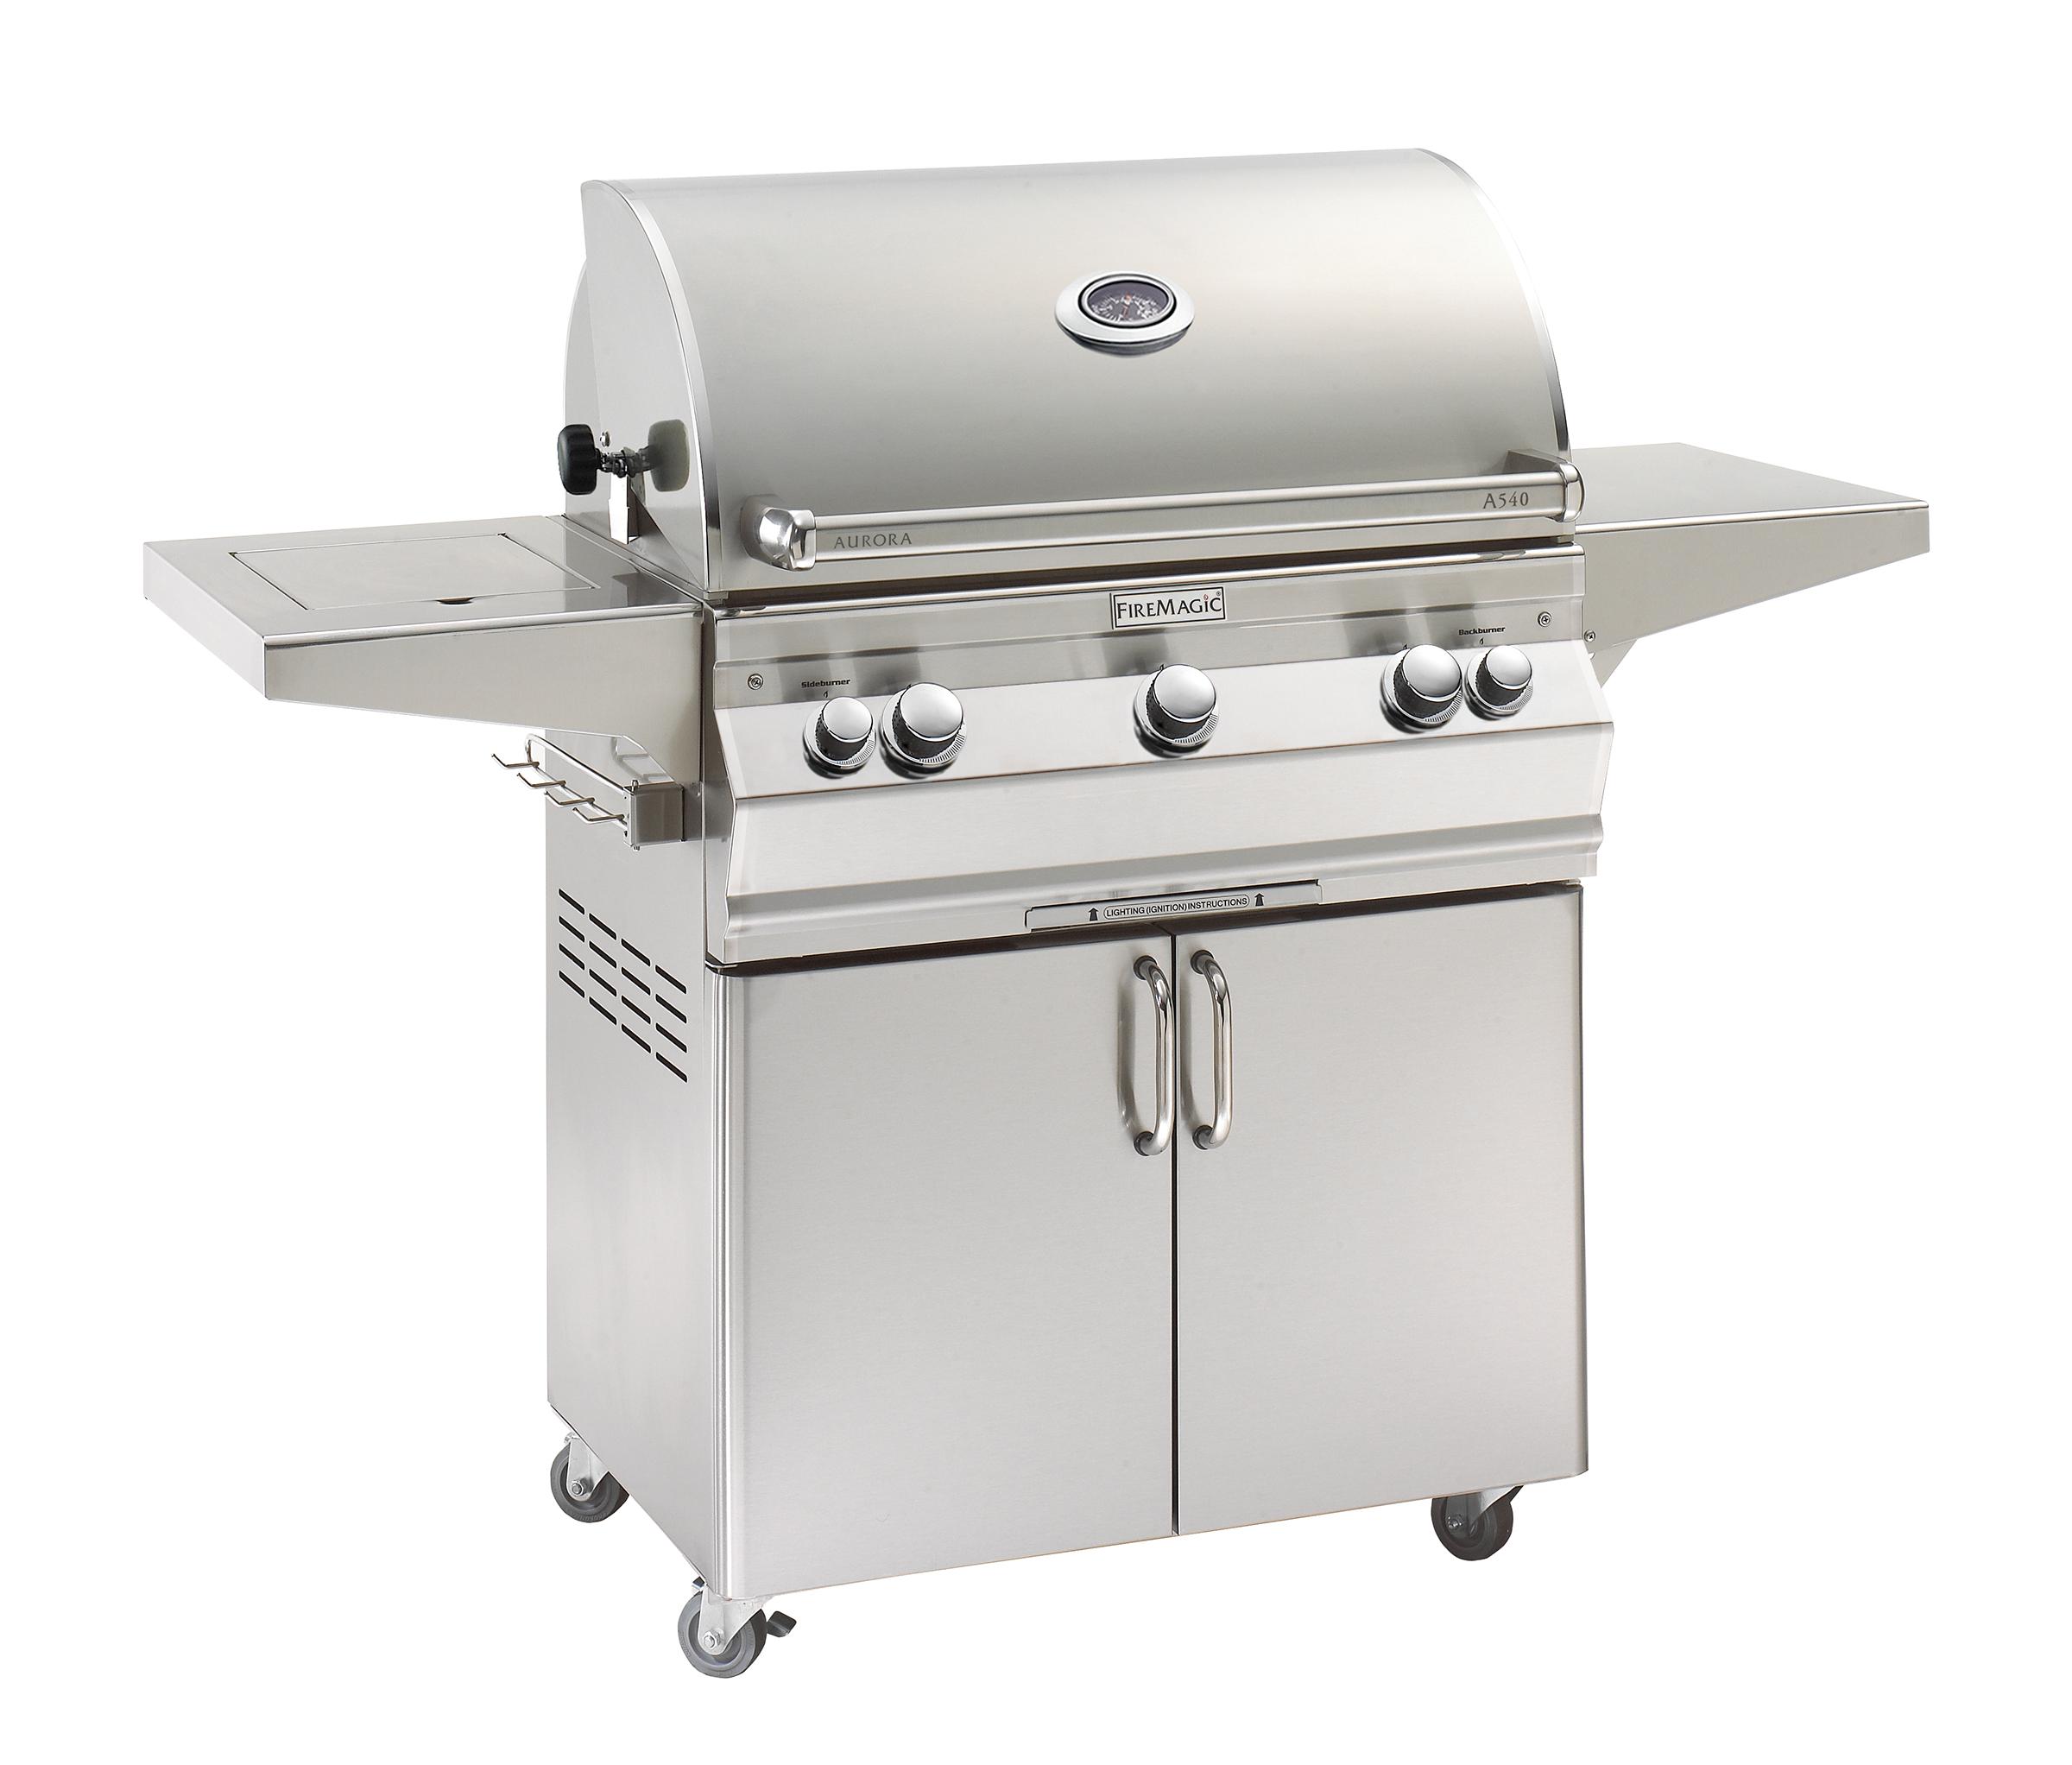 fm-a540s-aurora-analog-portable-grill.jpg